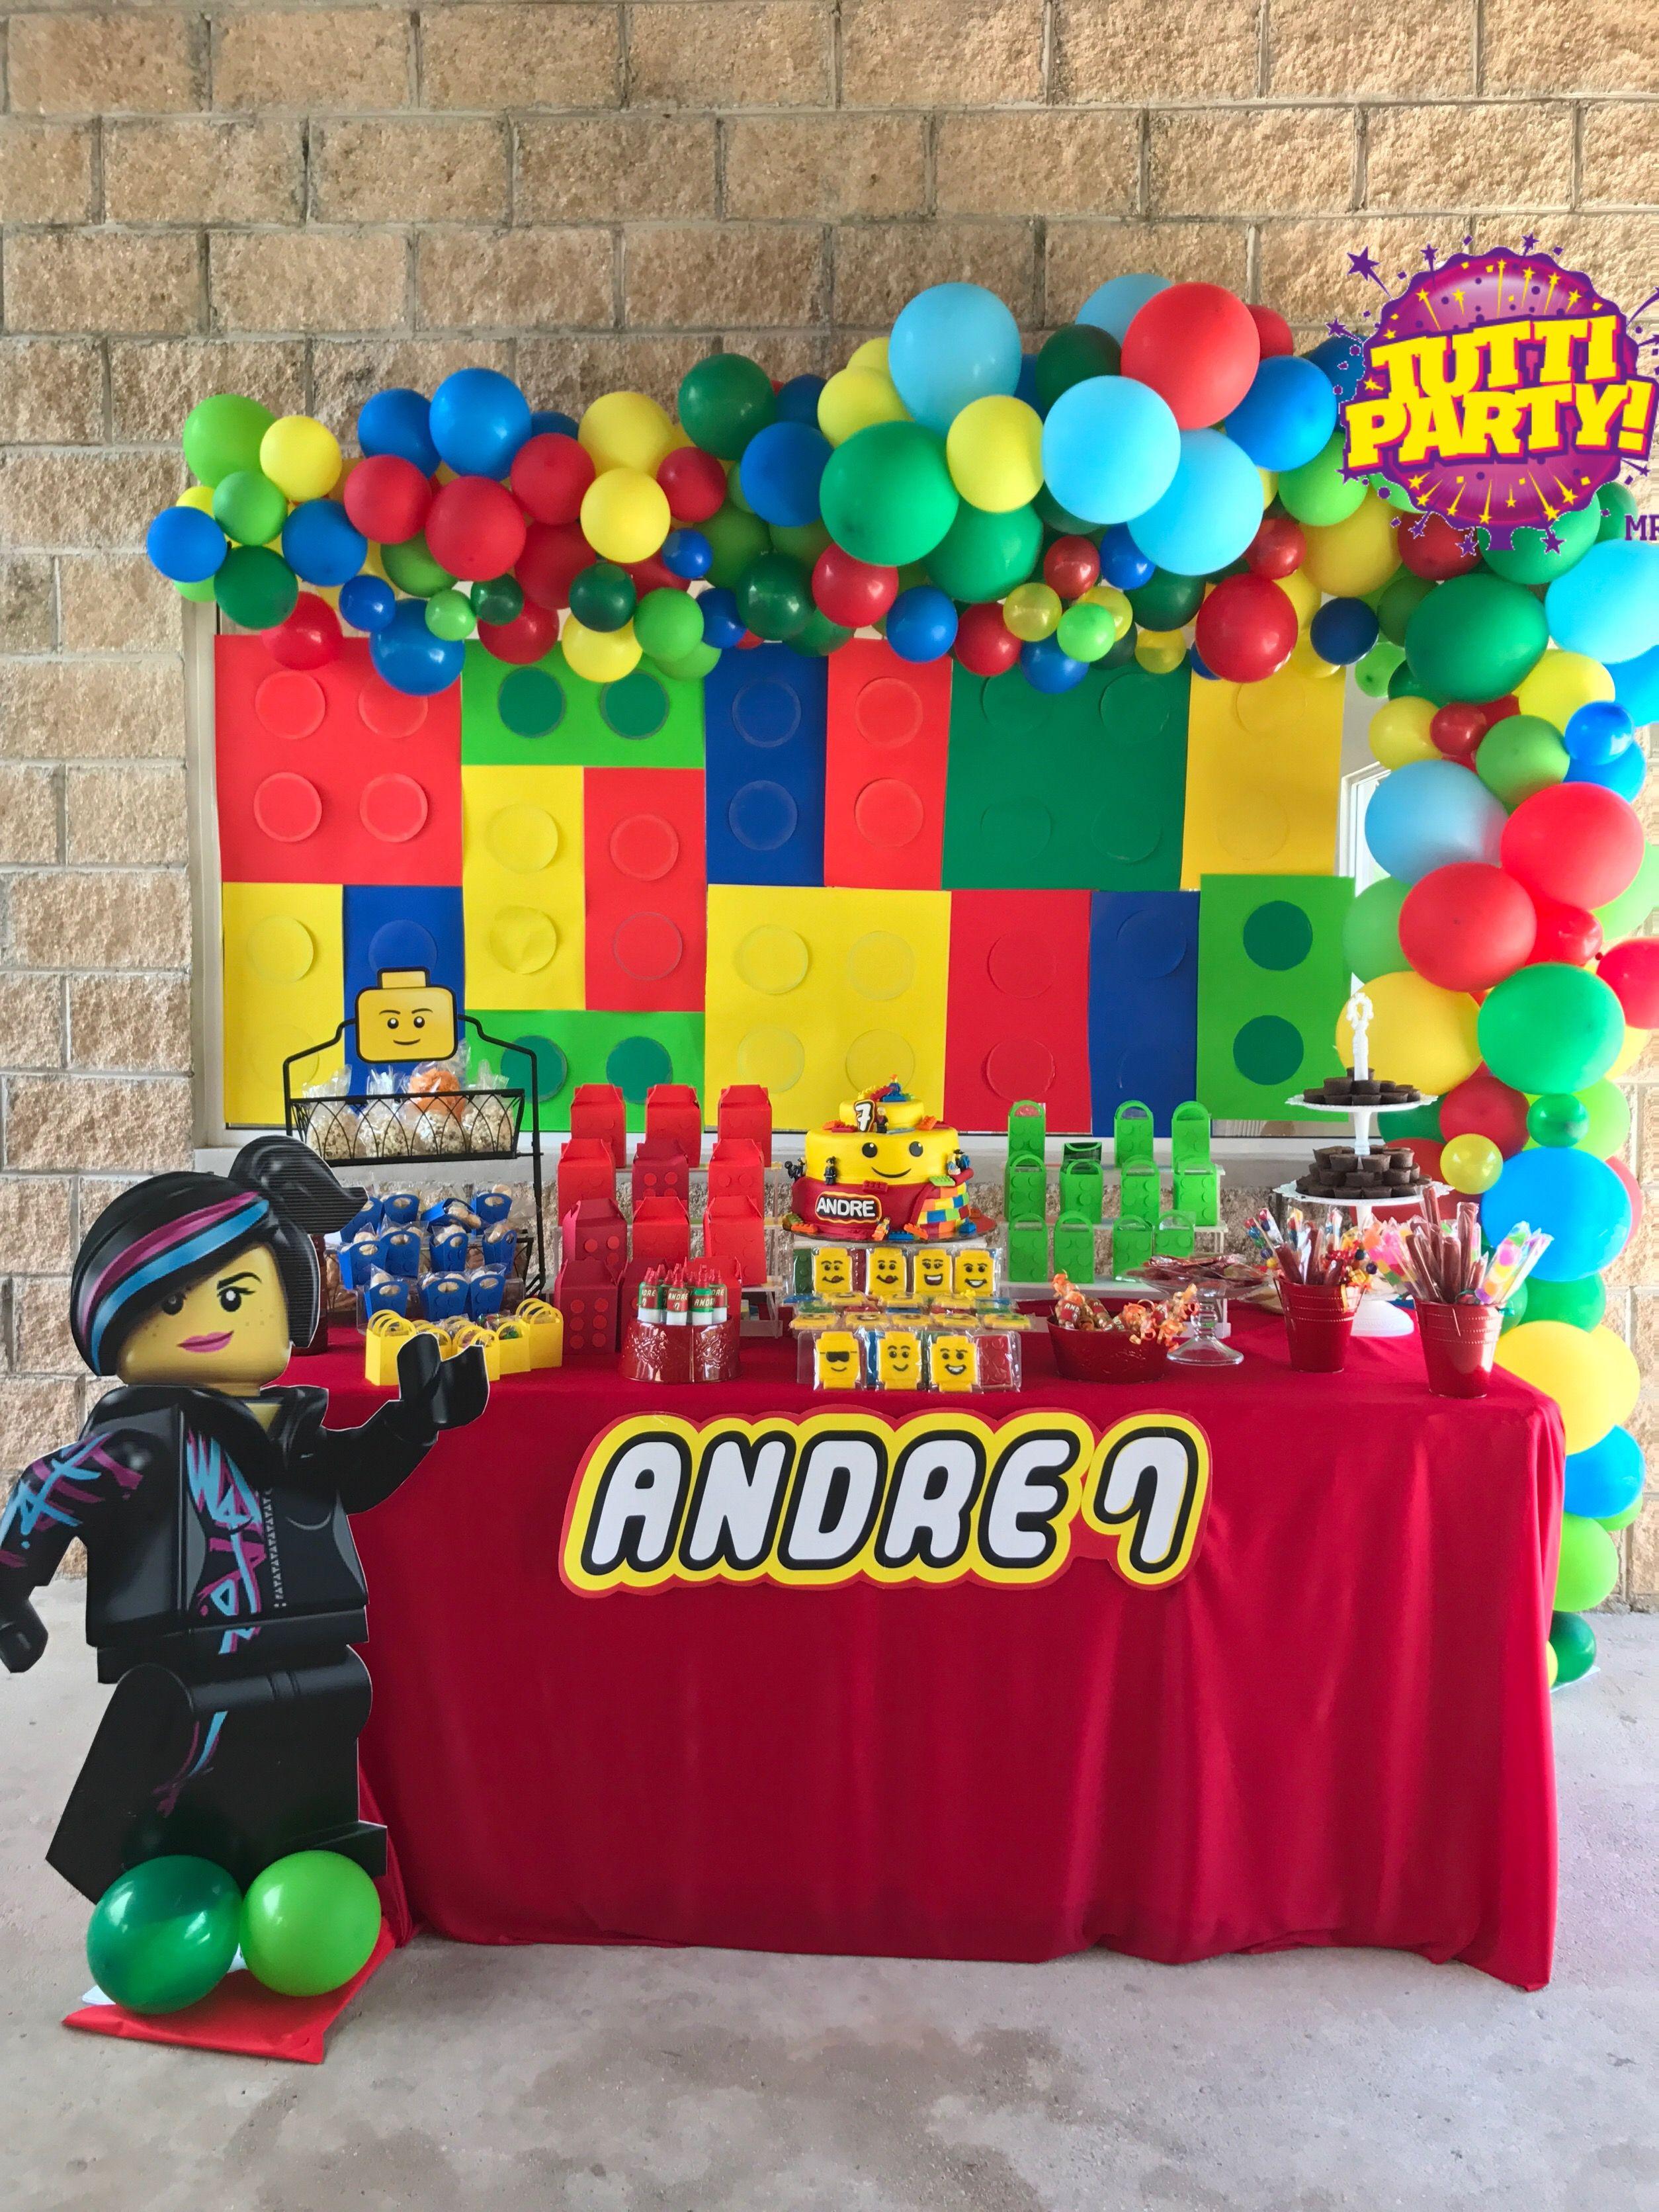 Lego party decorations, lego City party ideas, lego ...